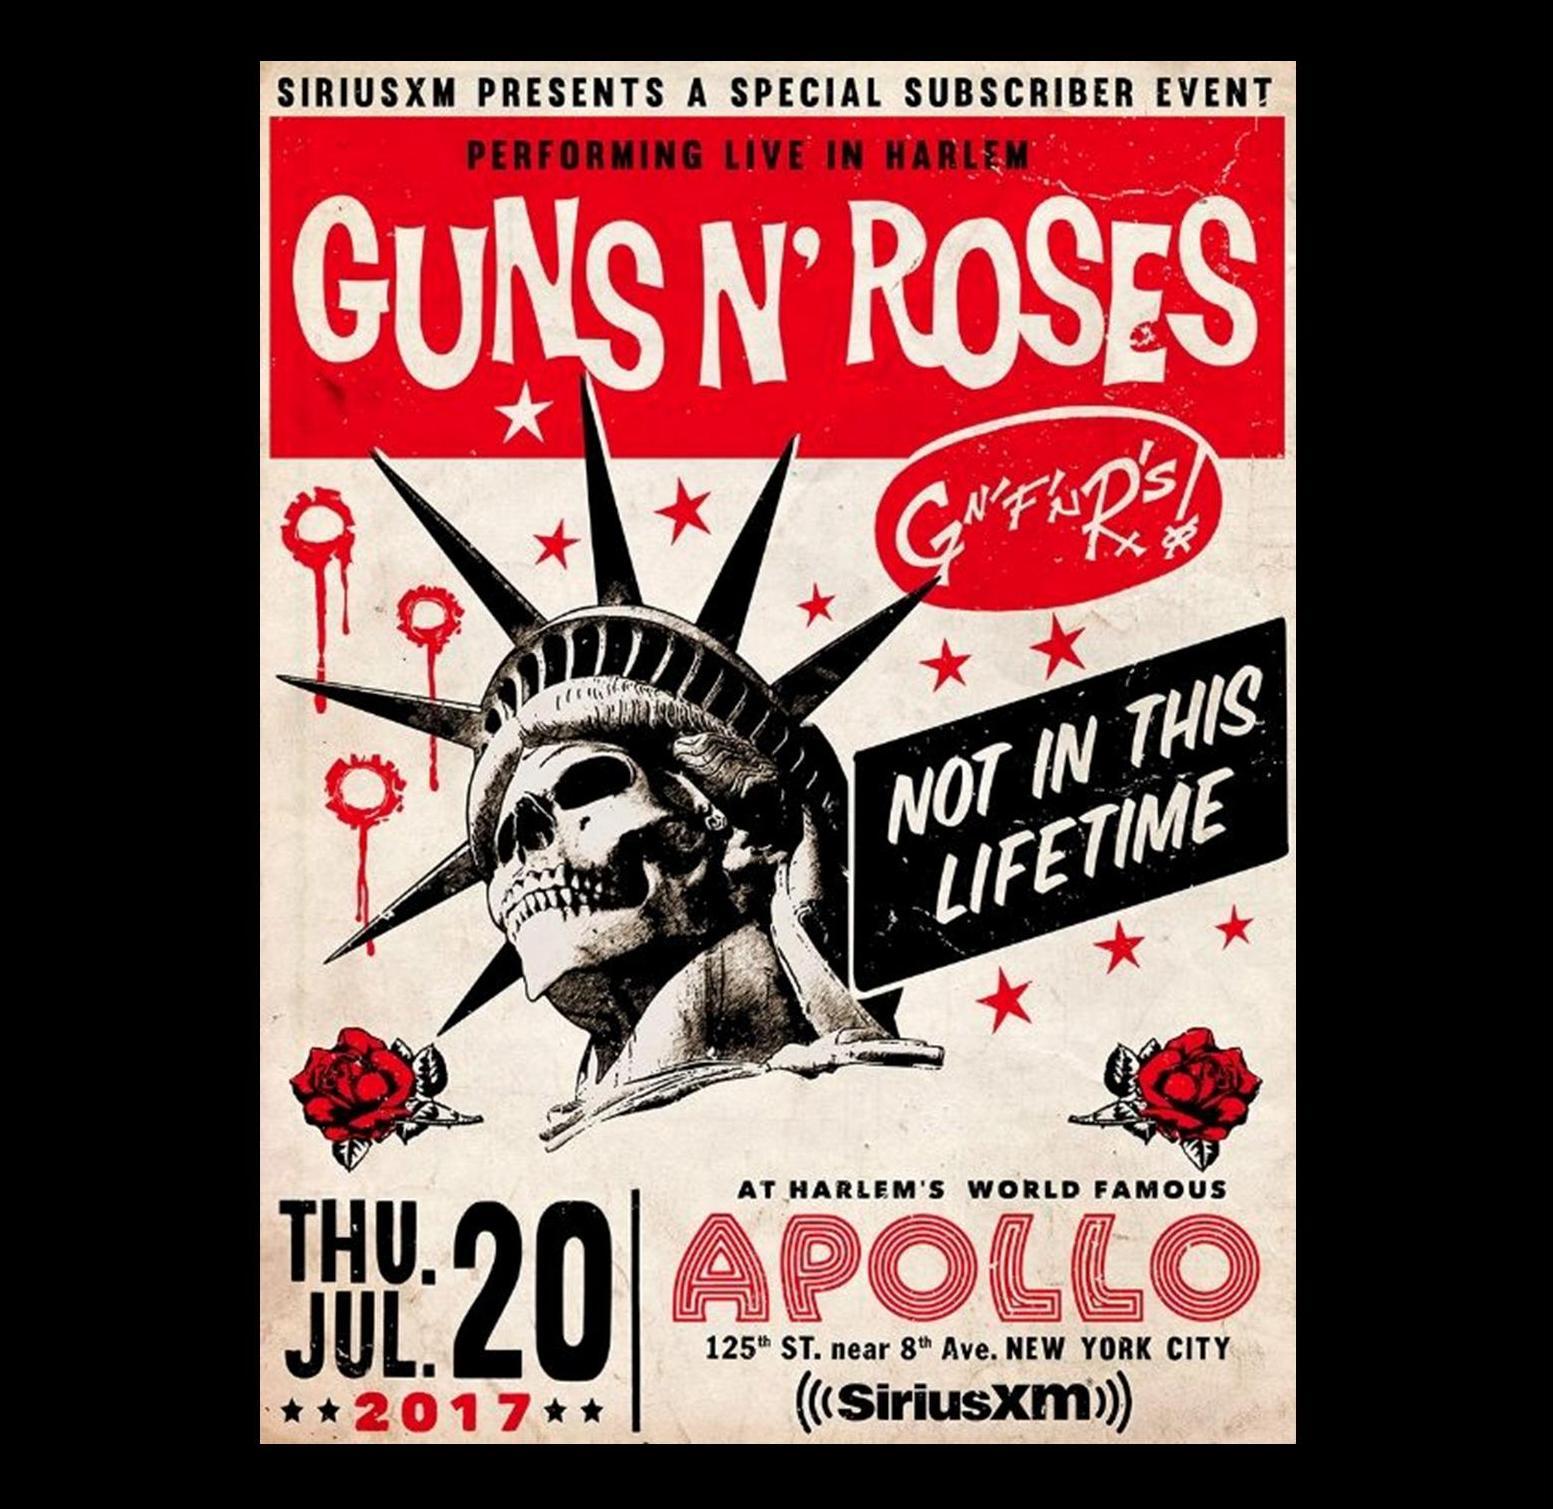 Guns N' Roses - 2017-07-20 - Apollo Theatre, New York City (Soundboard) G%2Band%2Br%2B7-20-17